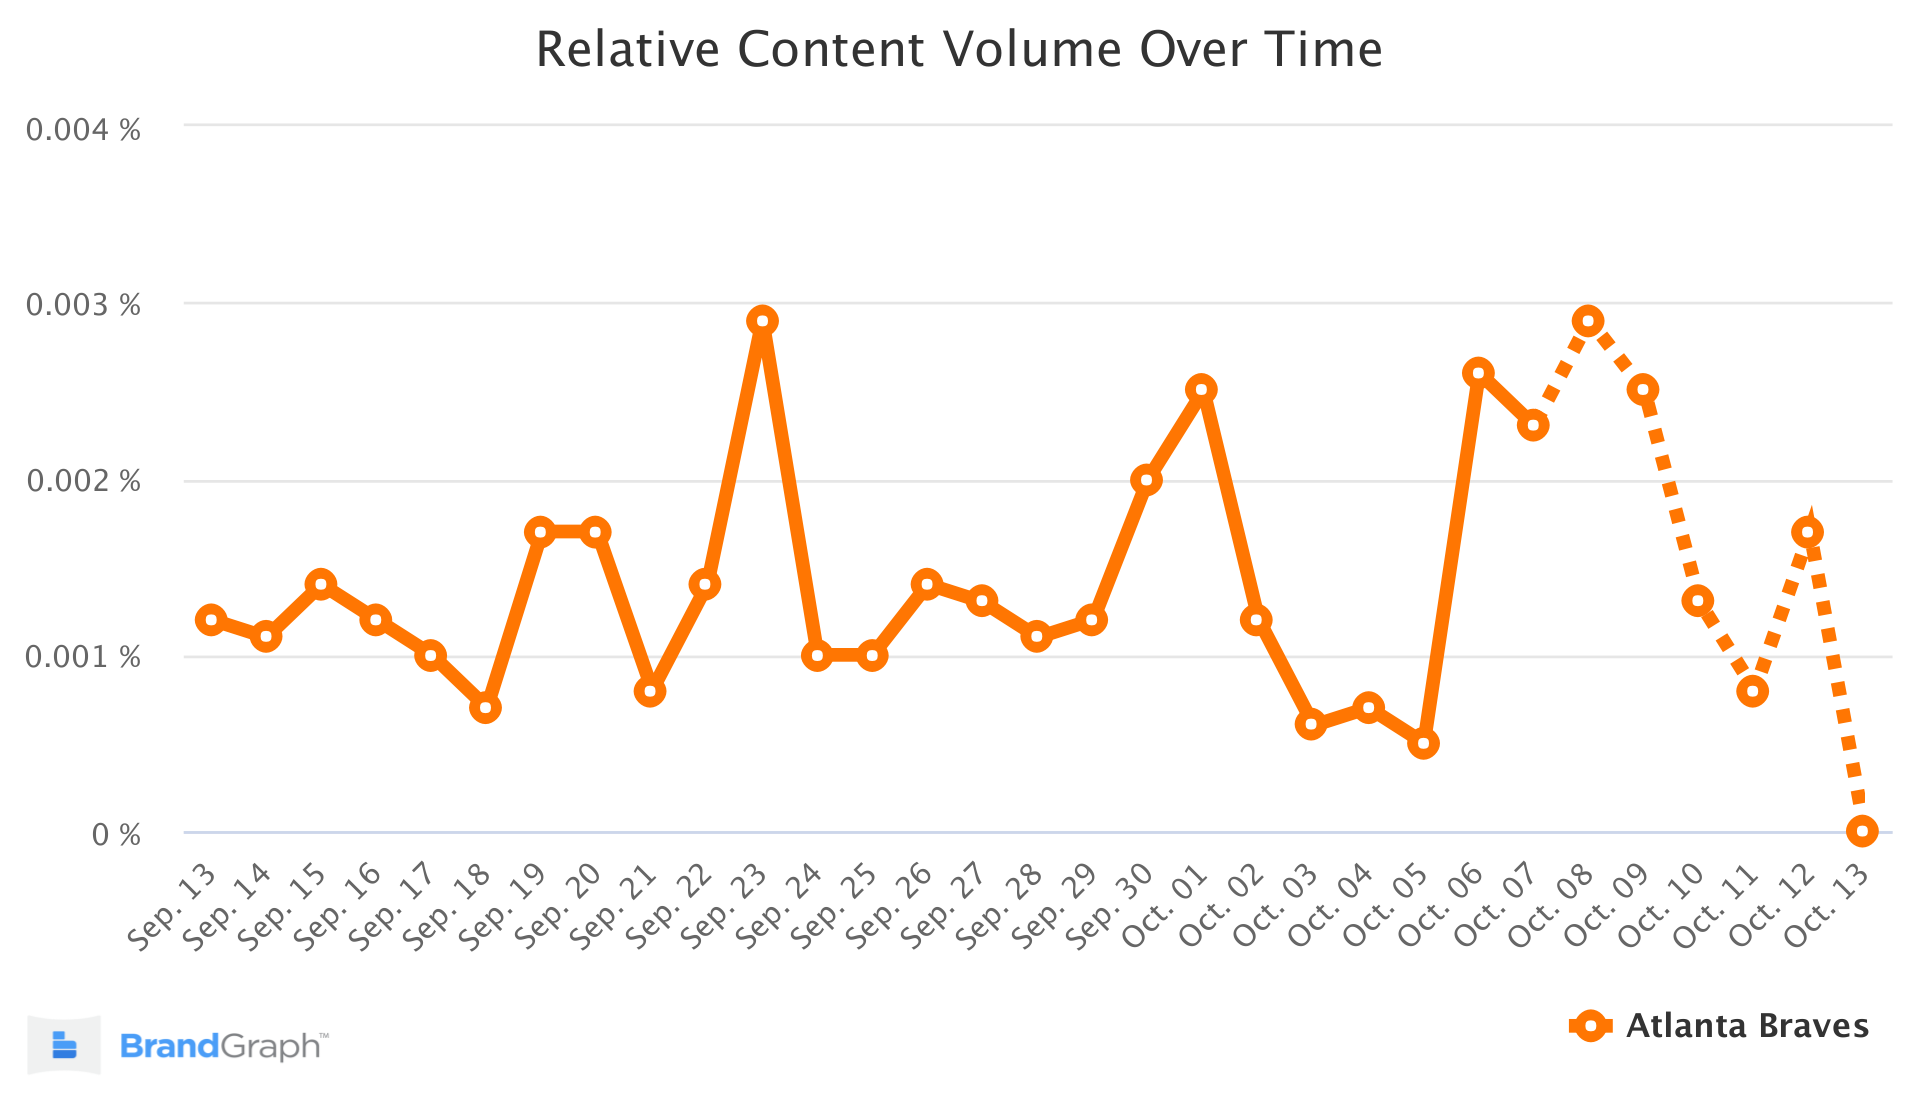 Atlanta Braves BrandGraph Trend